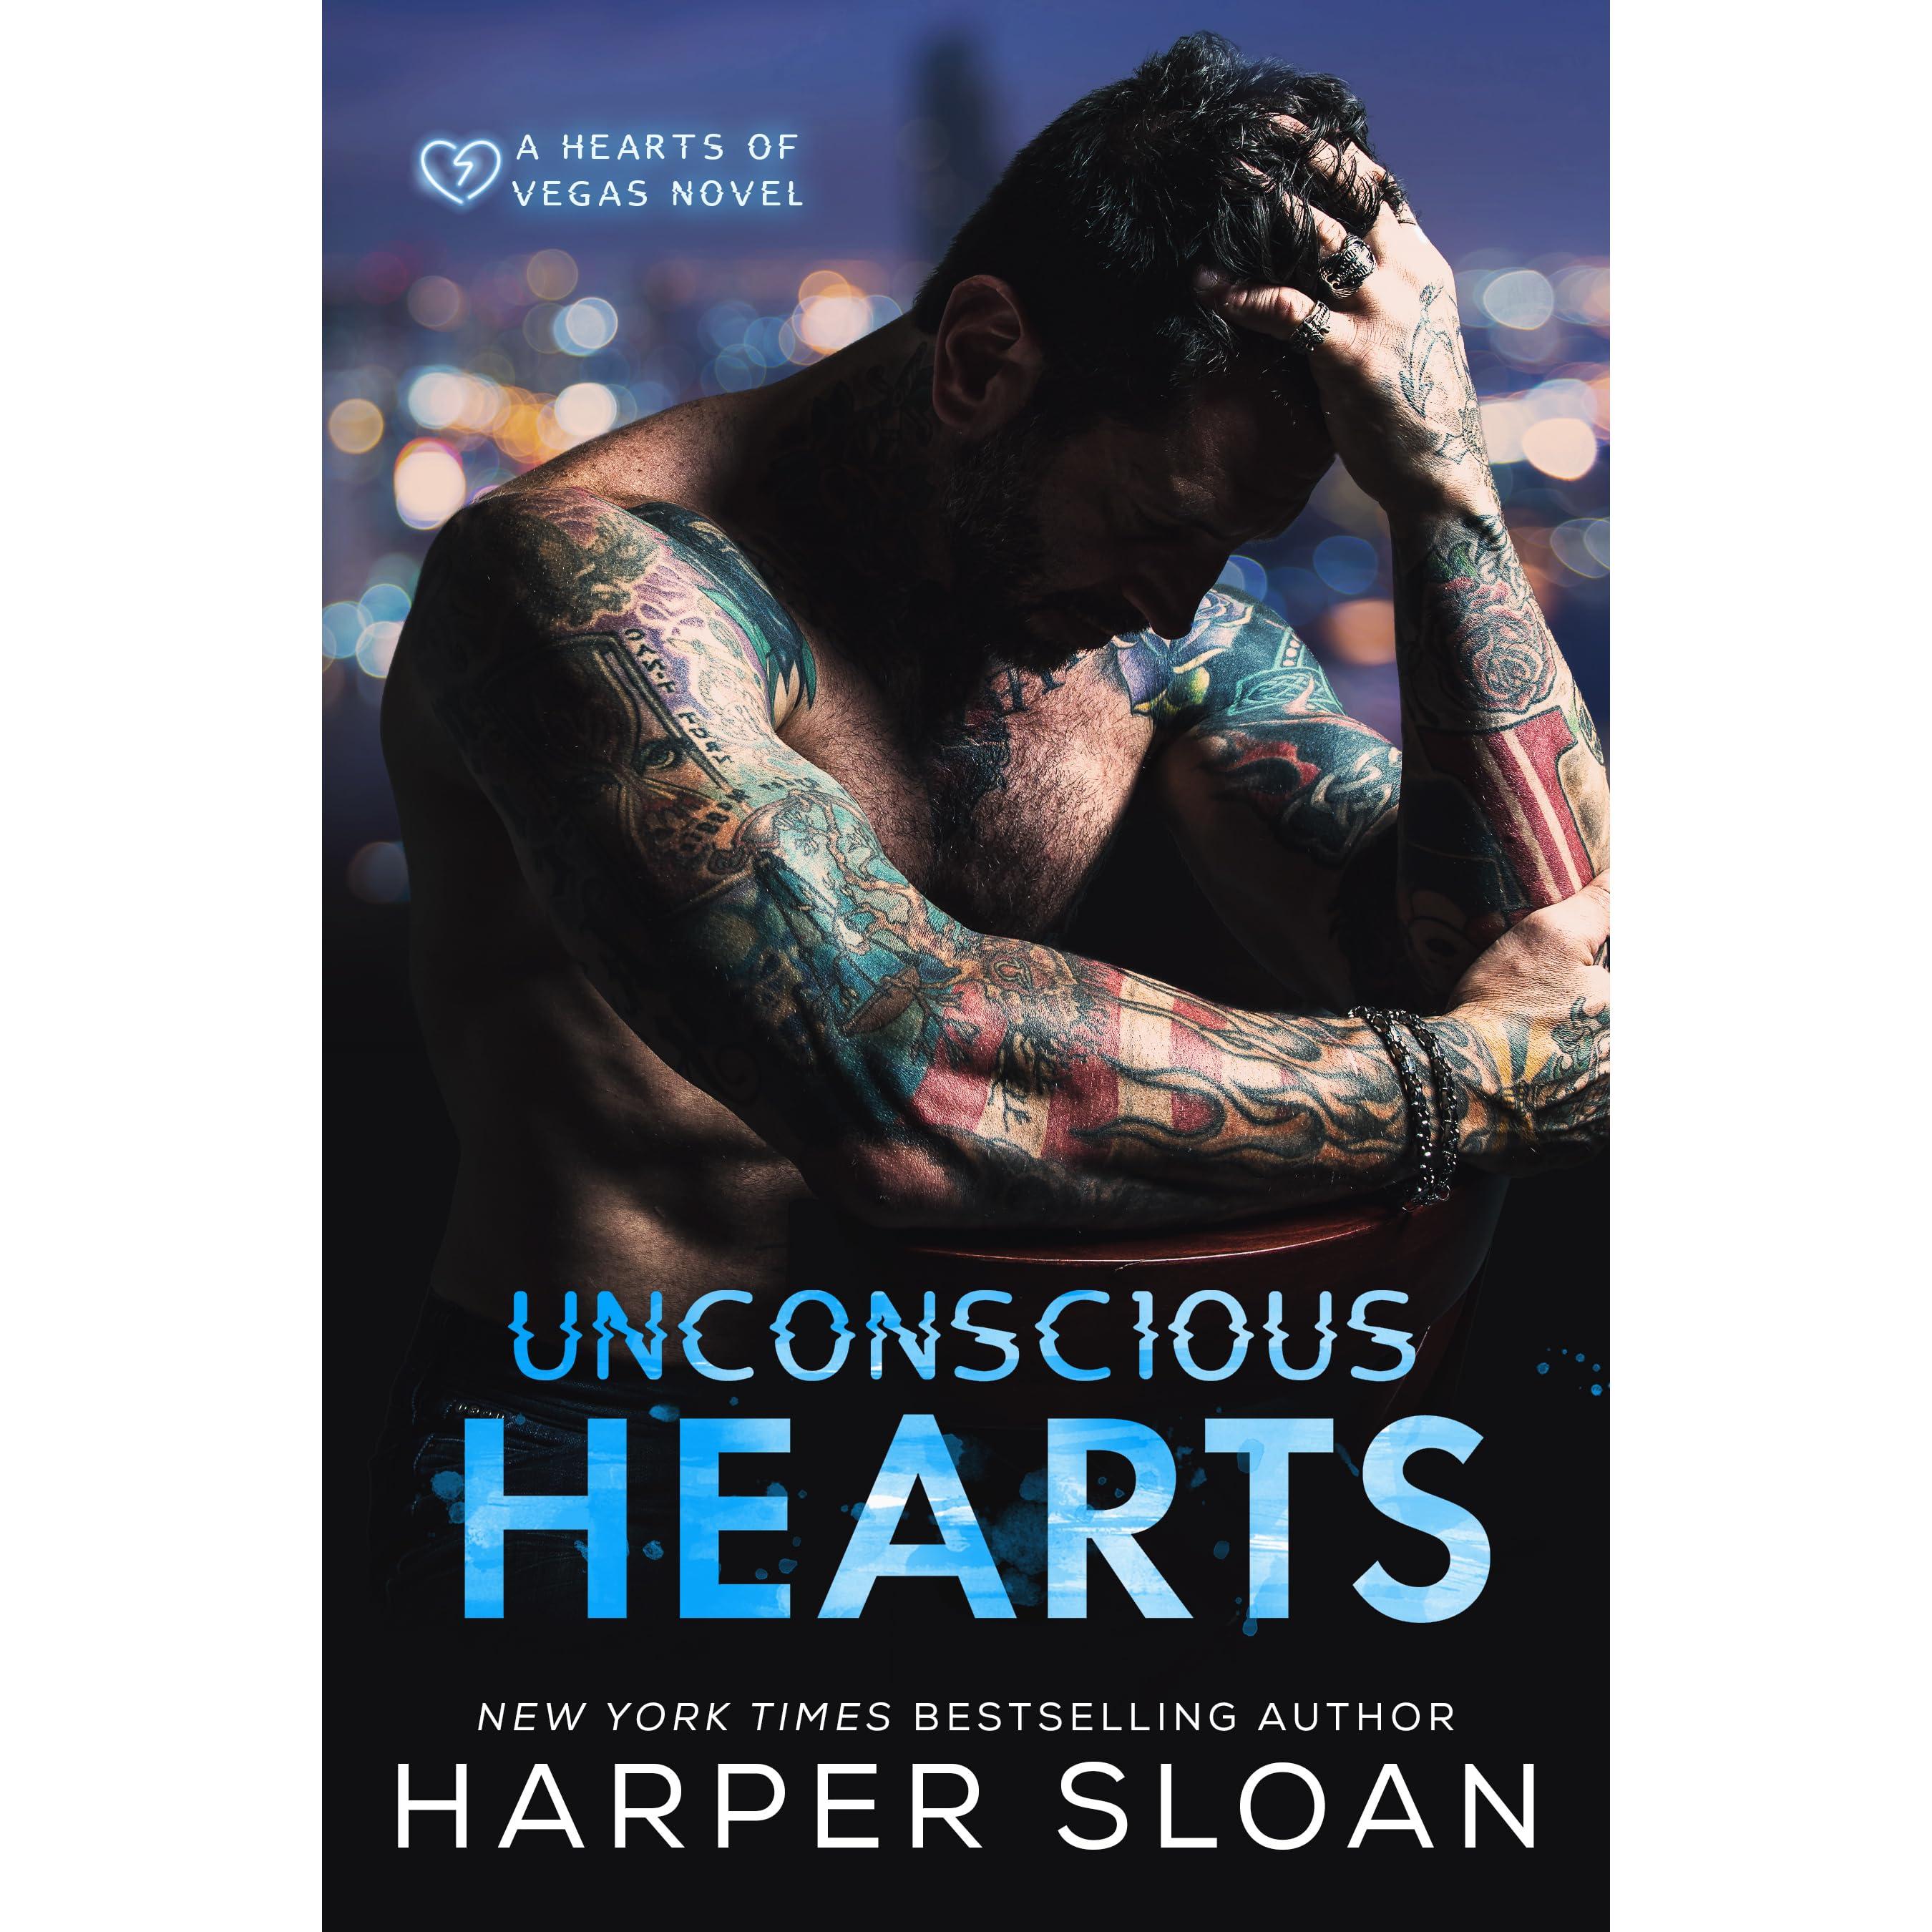 Cooper harper sloan goodreads giveaways